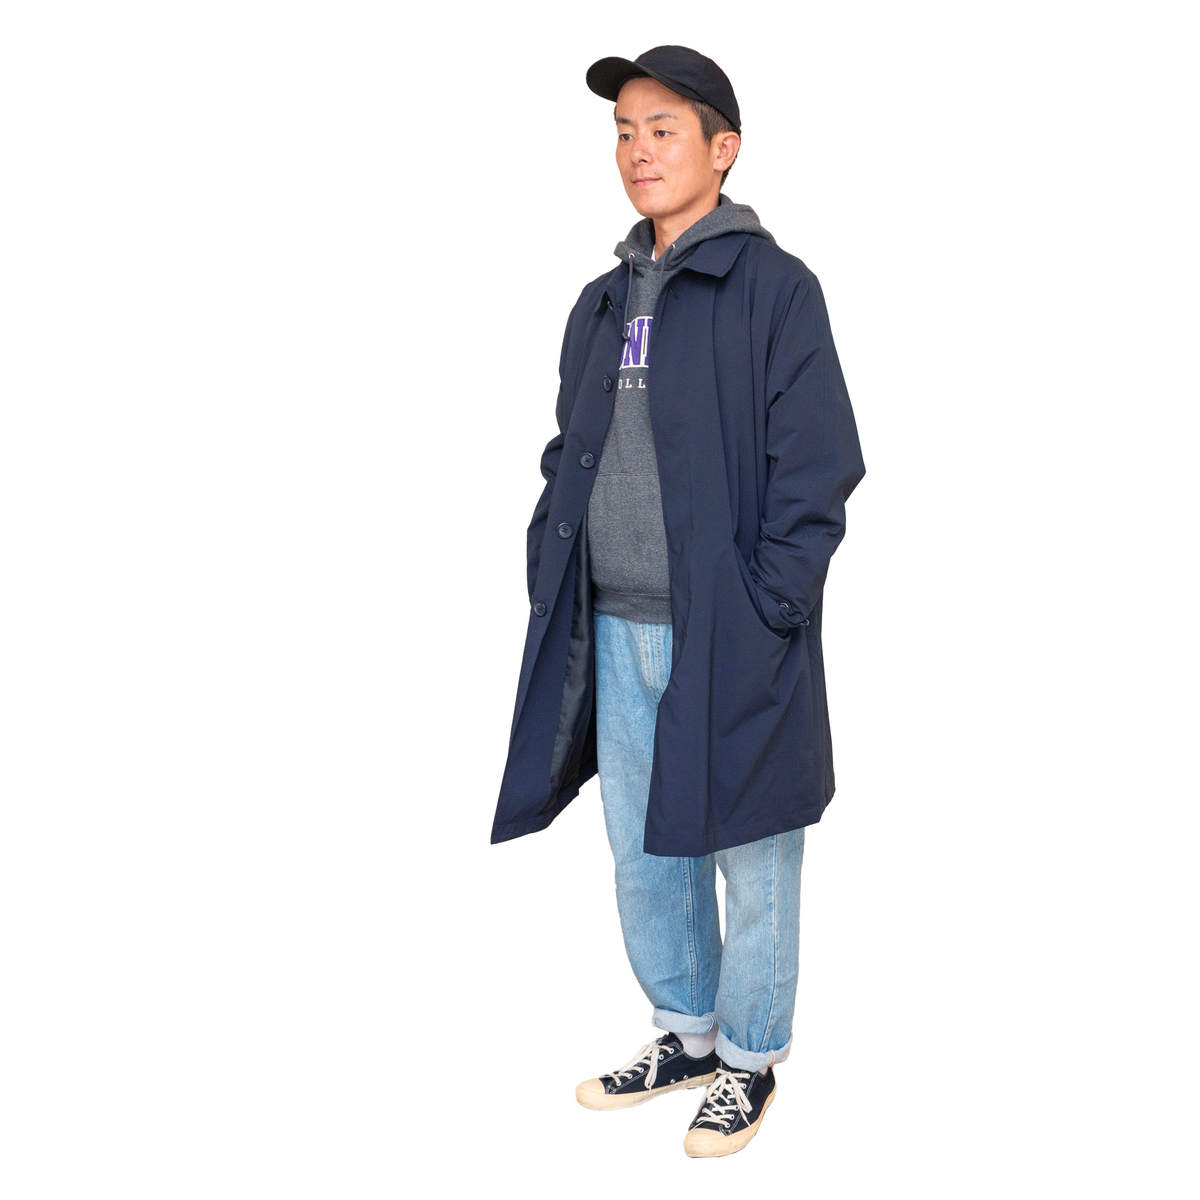 f:id:yamada0221:20210729124403j:plain